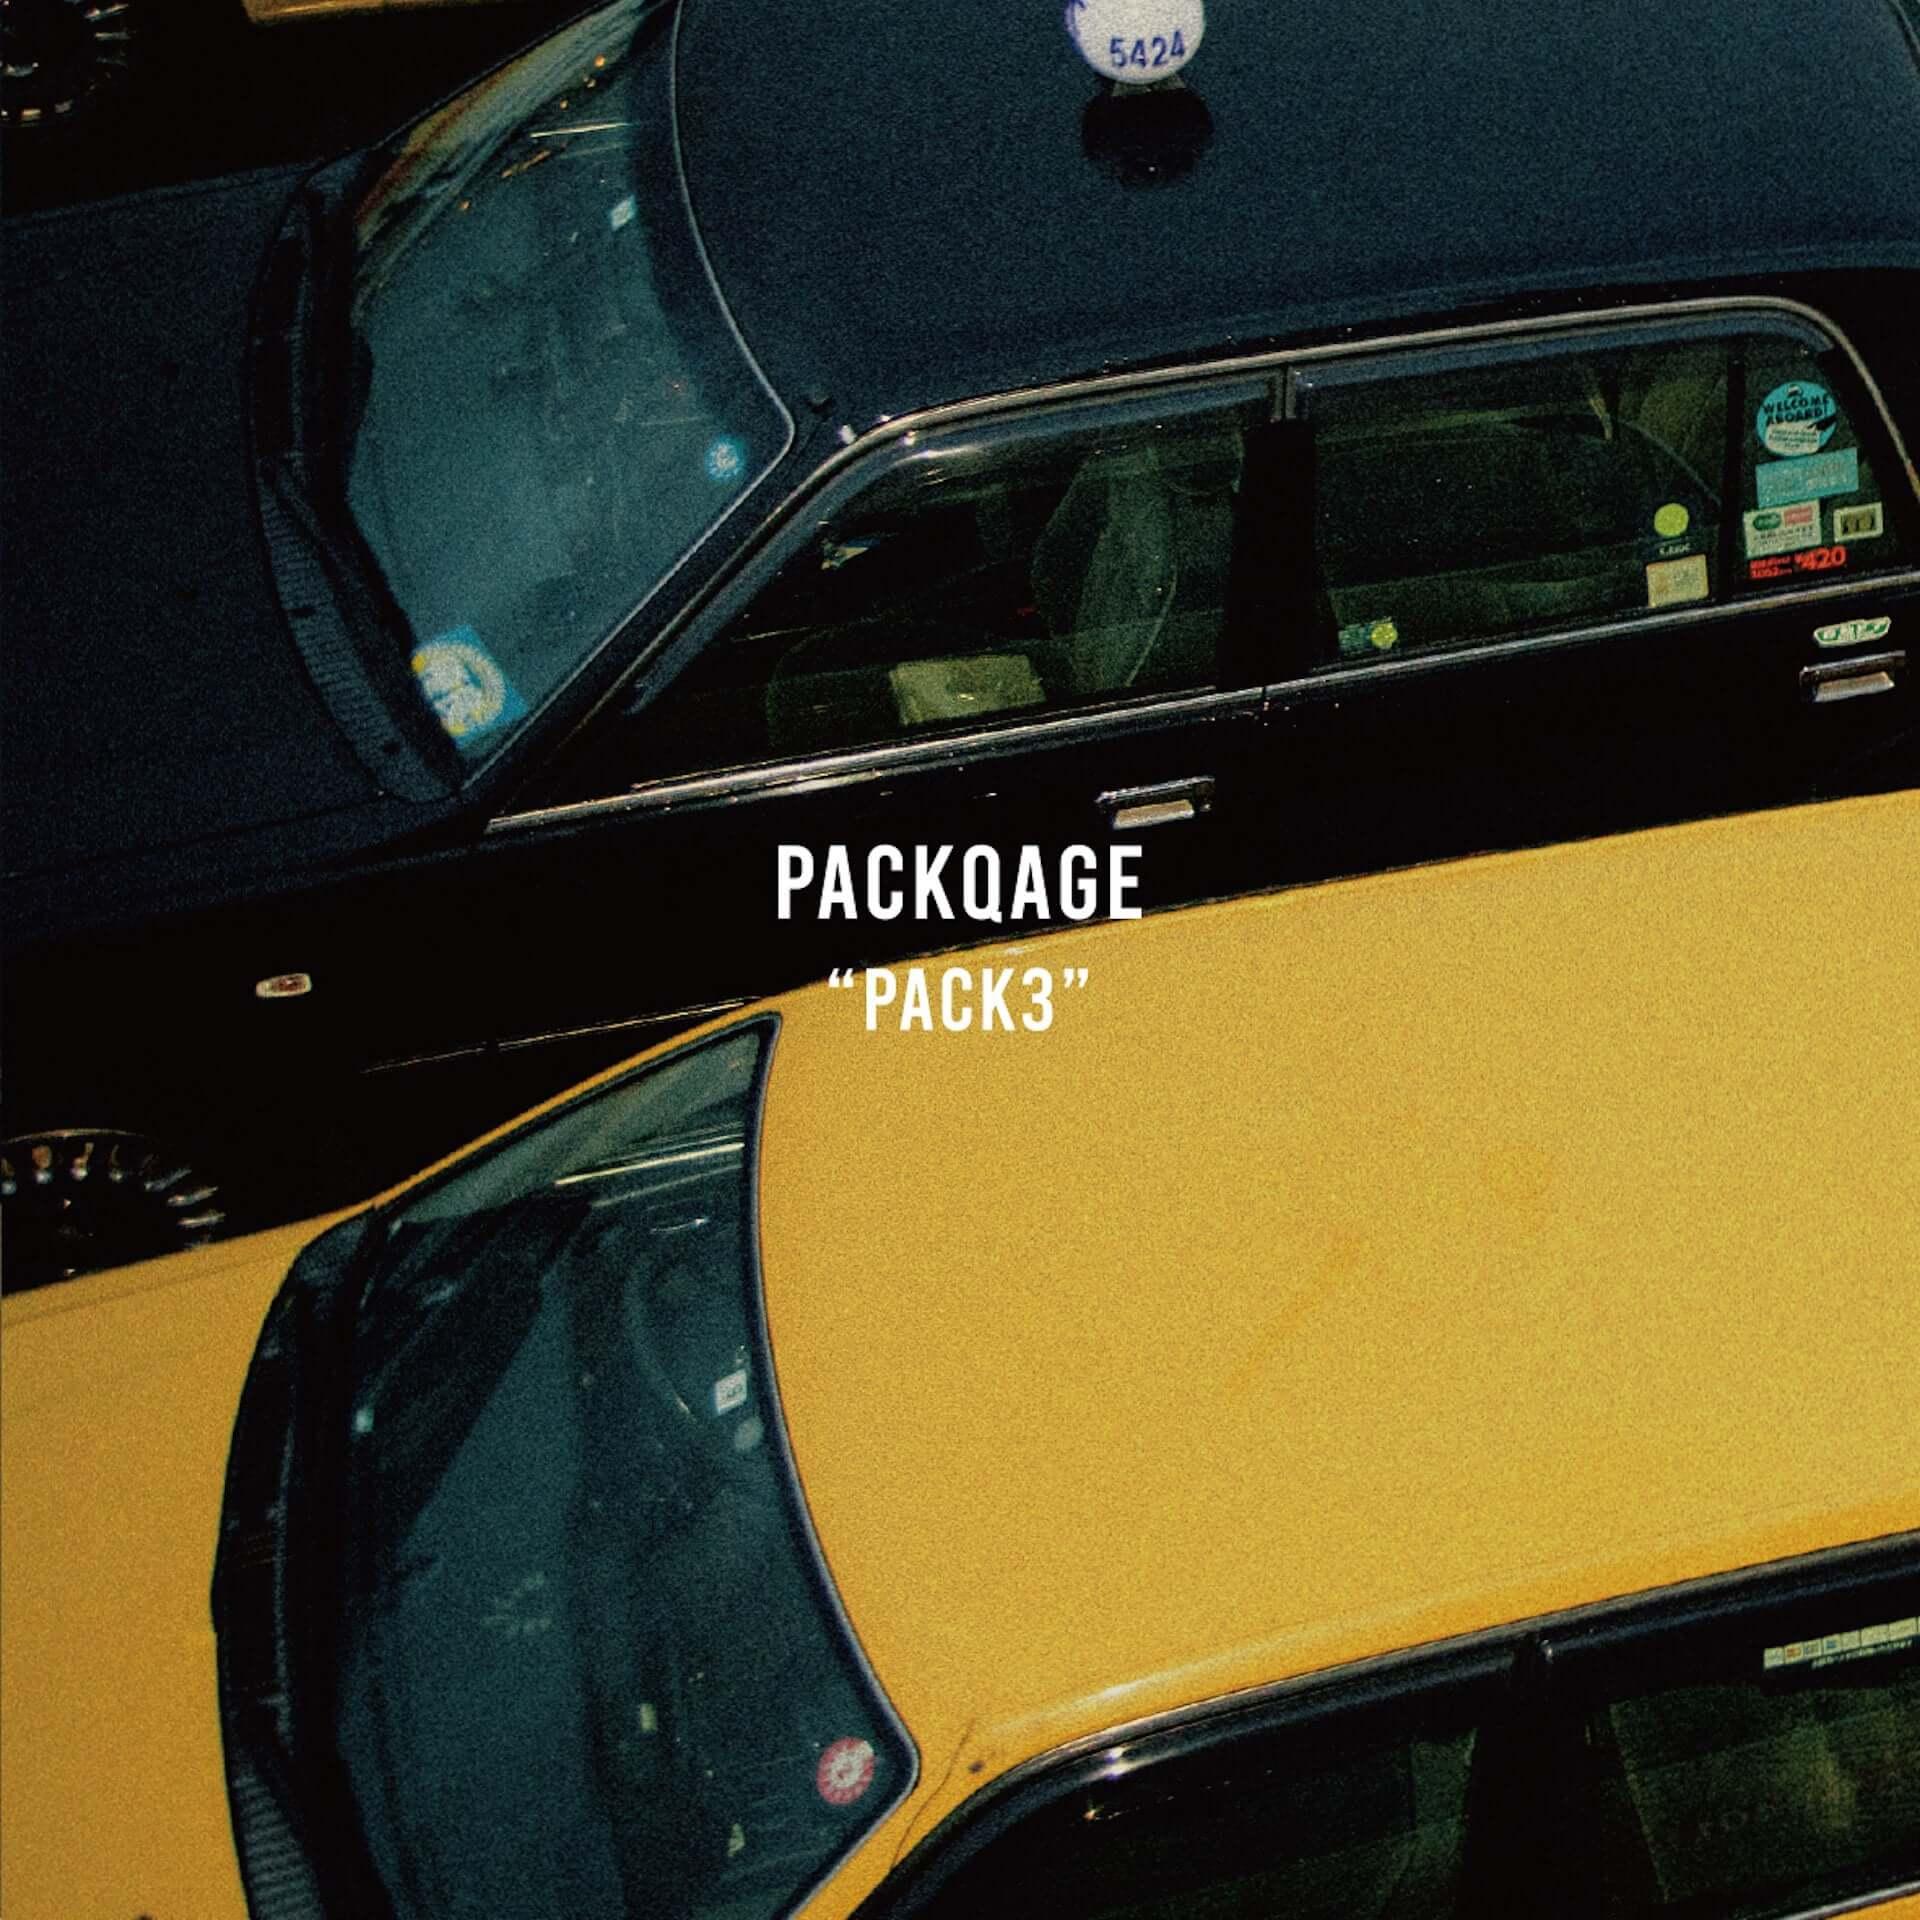 "BLABLA、Vue dumonde、m-alによるユニット・PACK3がデビューアルバム『PACKQAGE』のCDを本日発売!OMSB参加の楽曲""Discovery""MVも公開 music201216_pack3_1-1-1920x1920"